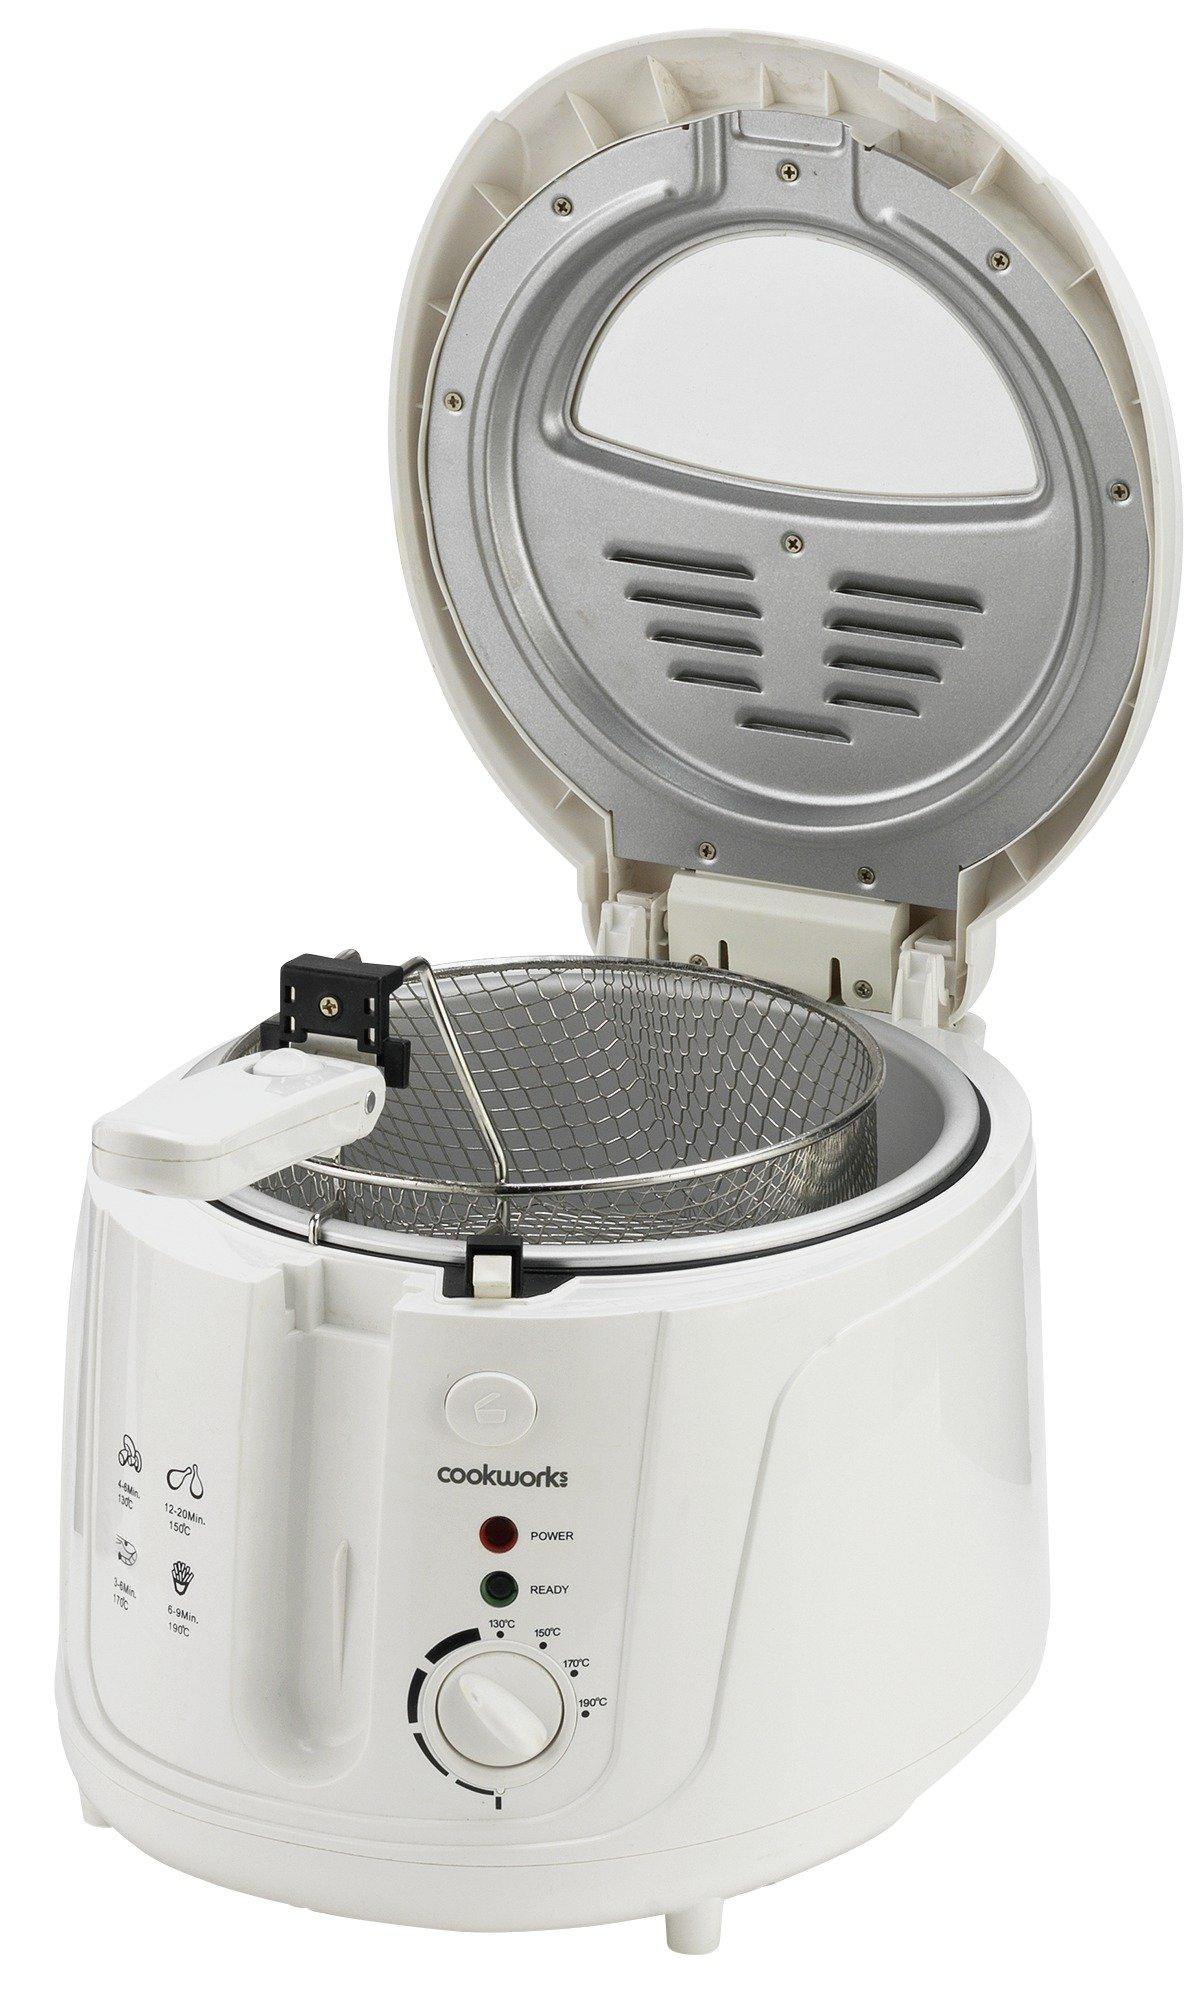 Cookworks DF5318-GS Deep Fat Fryer - White